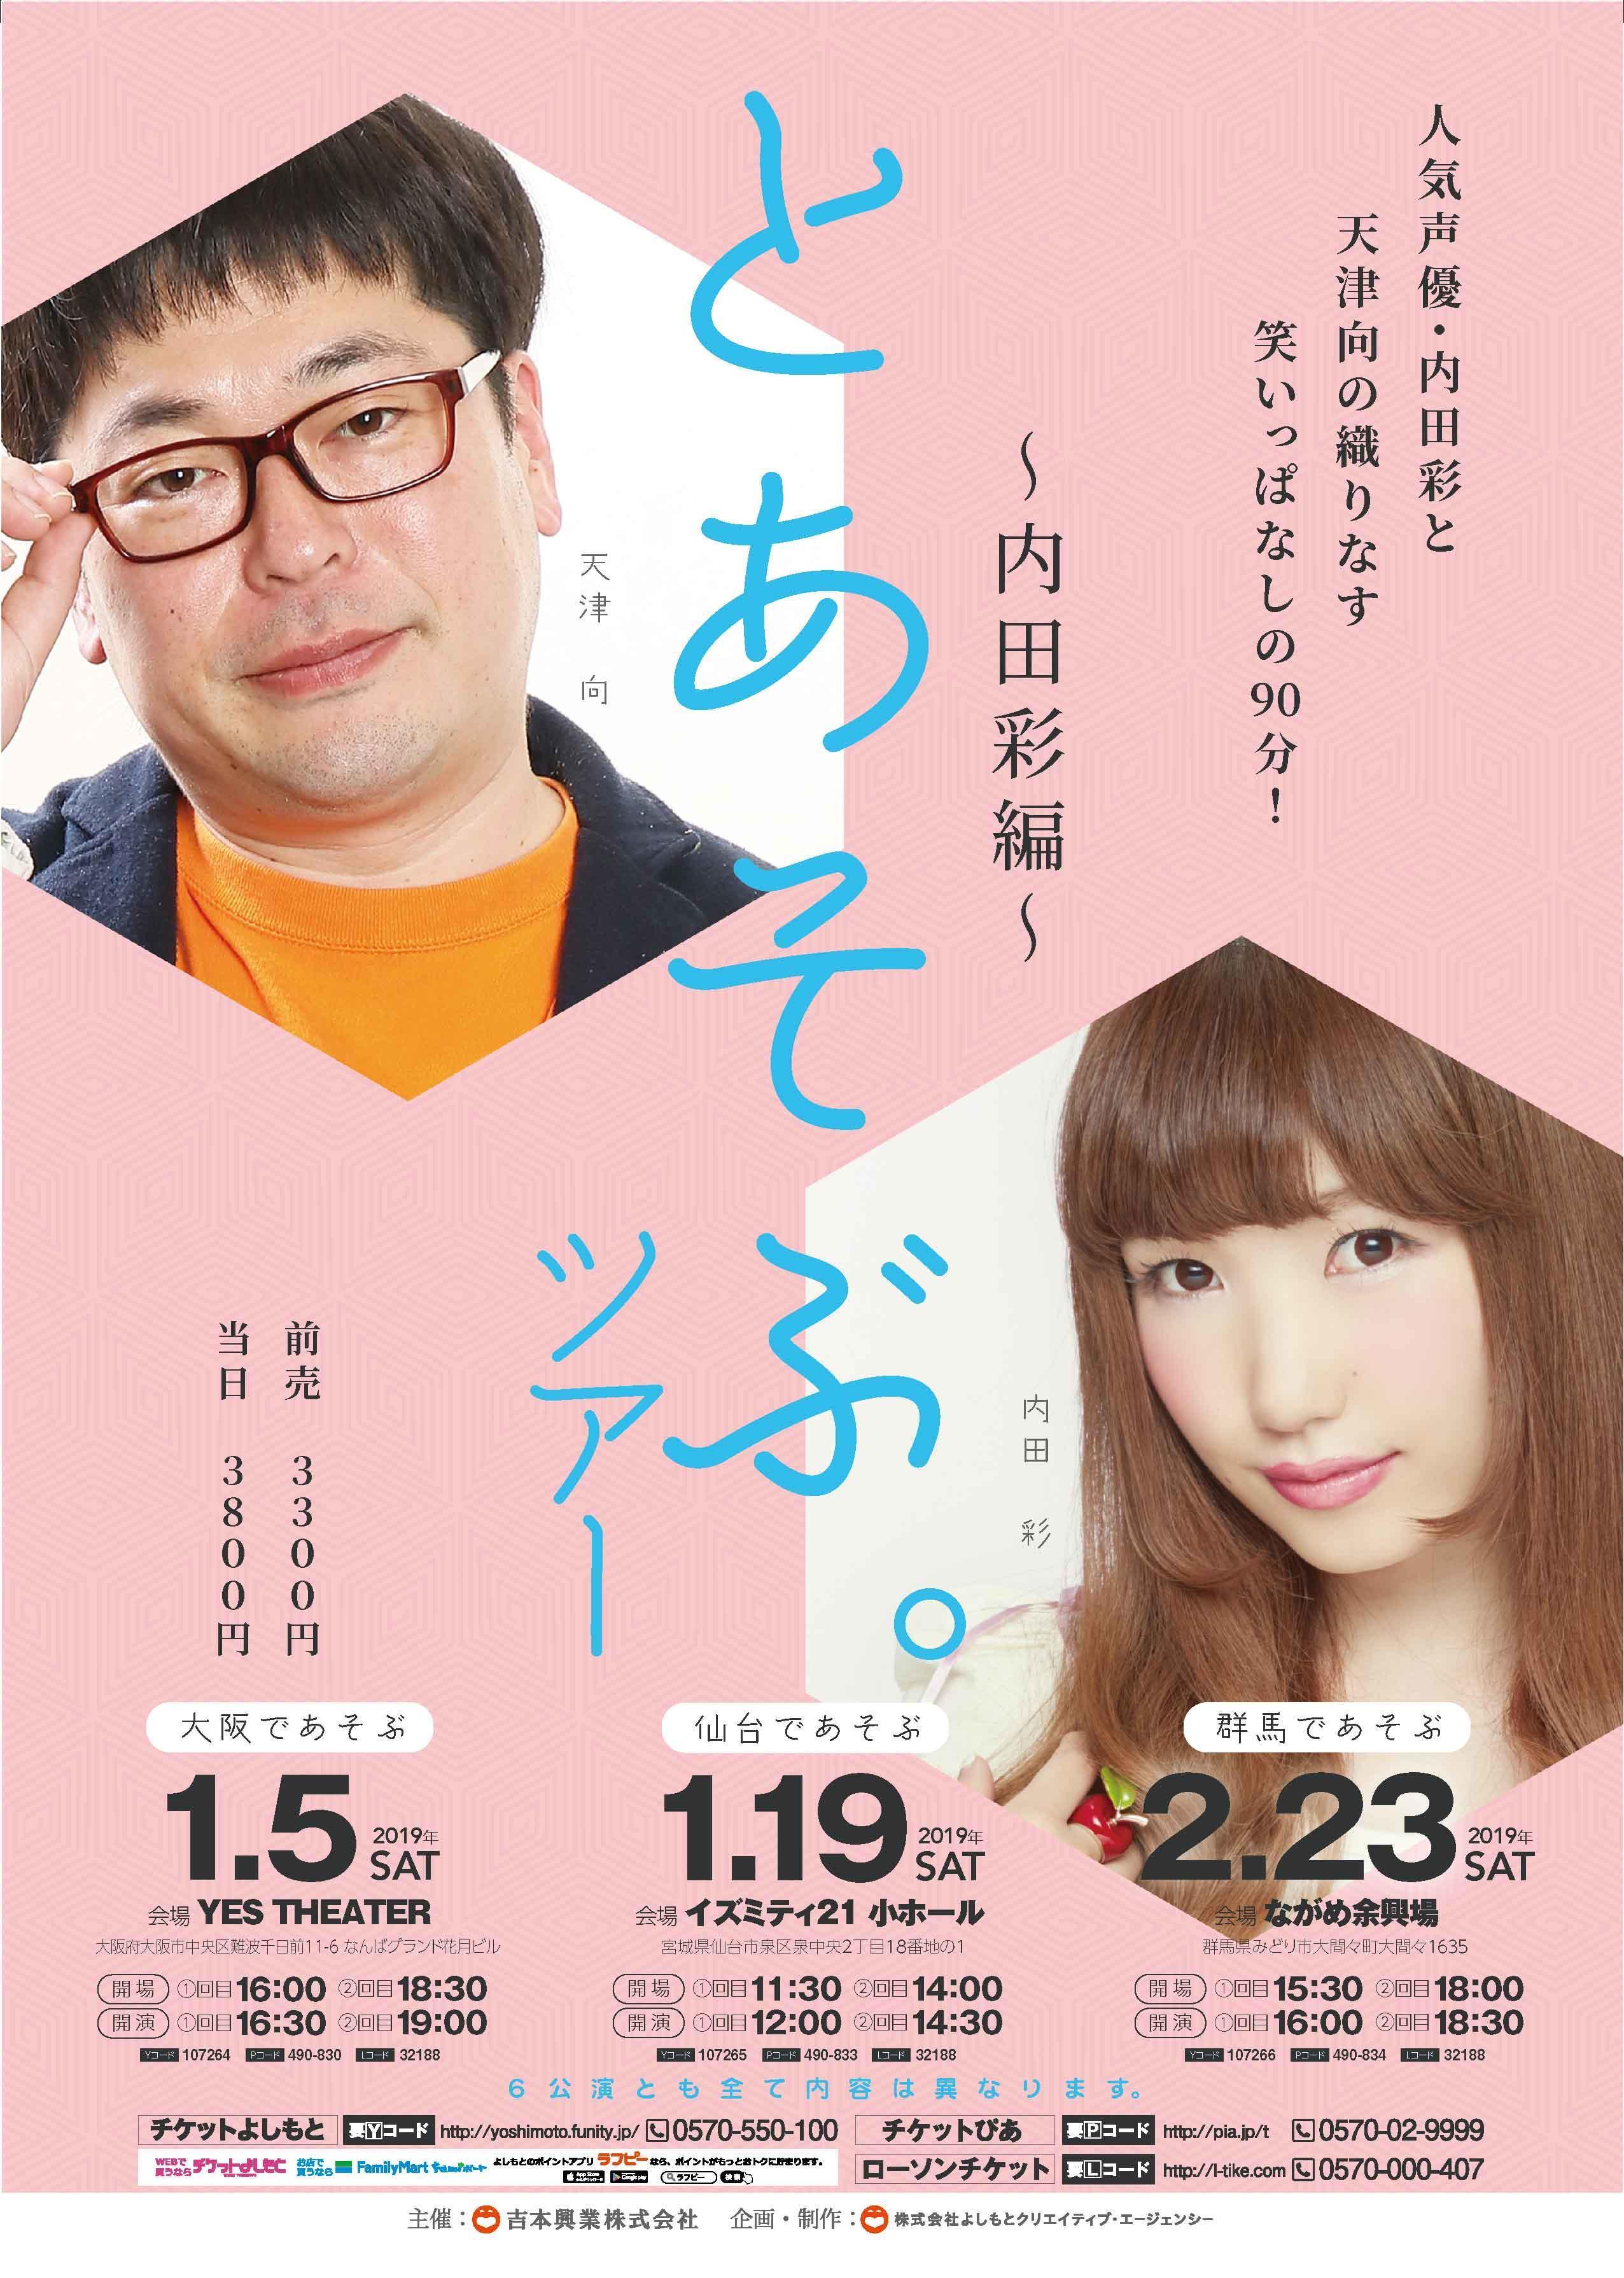 http://news.yoshimoto.co.jp/20190112205134-805095cf0f6702a9182f9abdf8ad6fb3c6a5b0ee.jpg